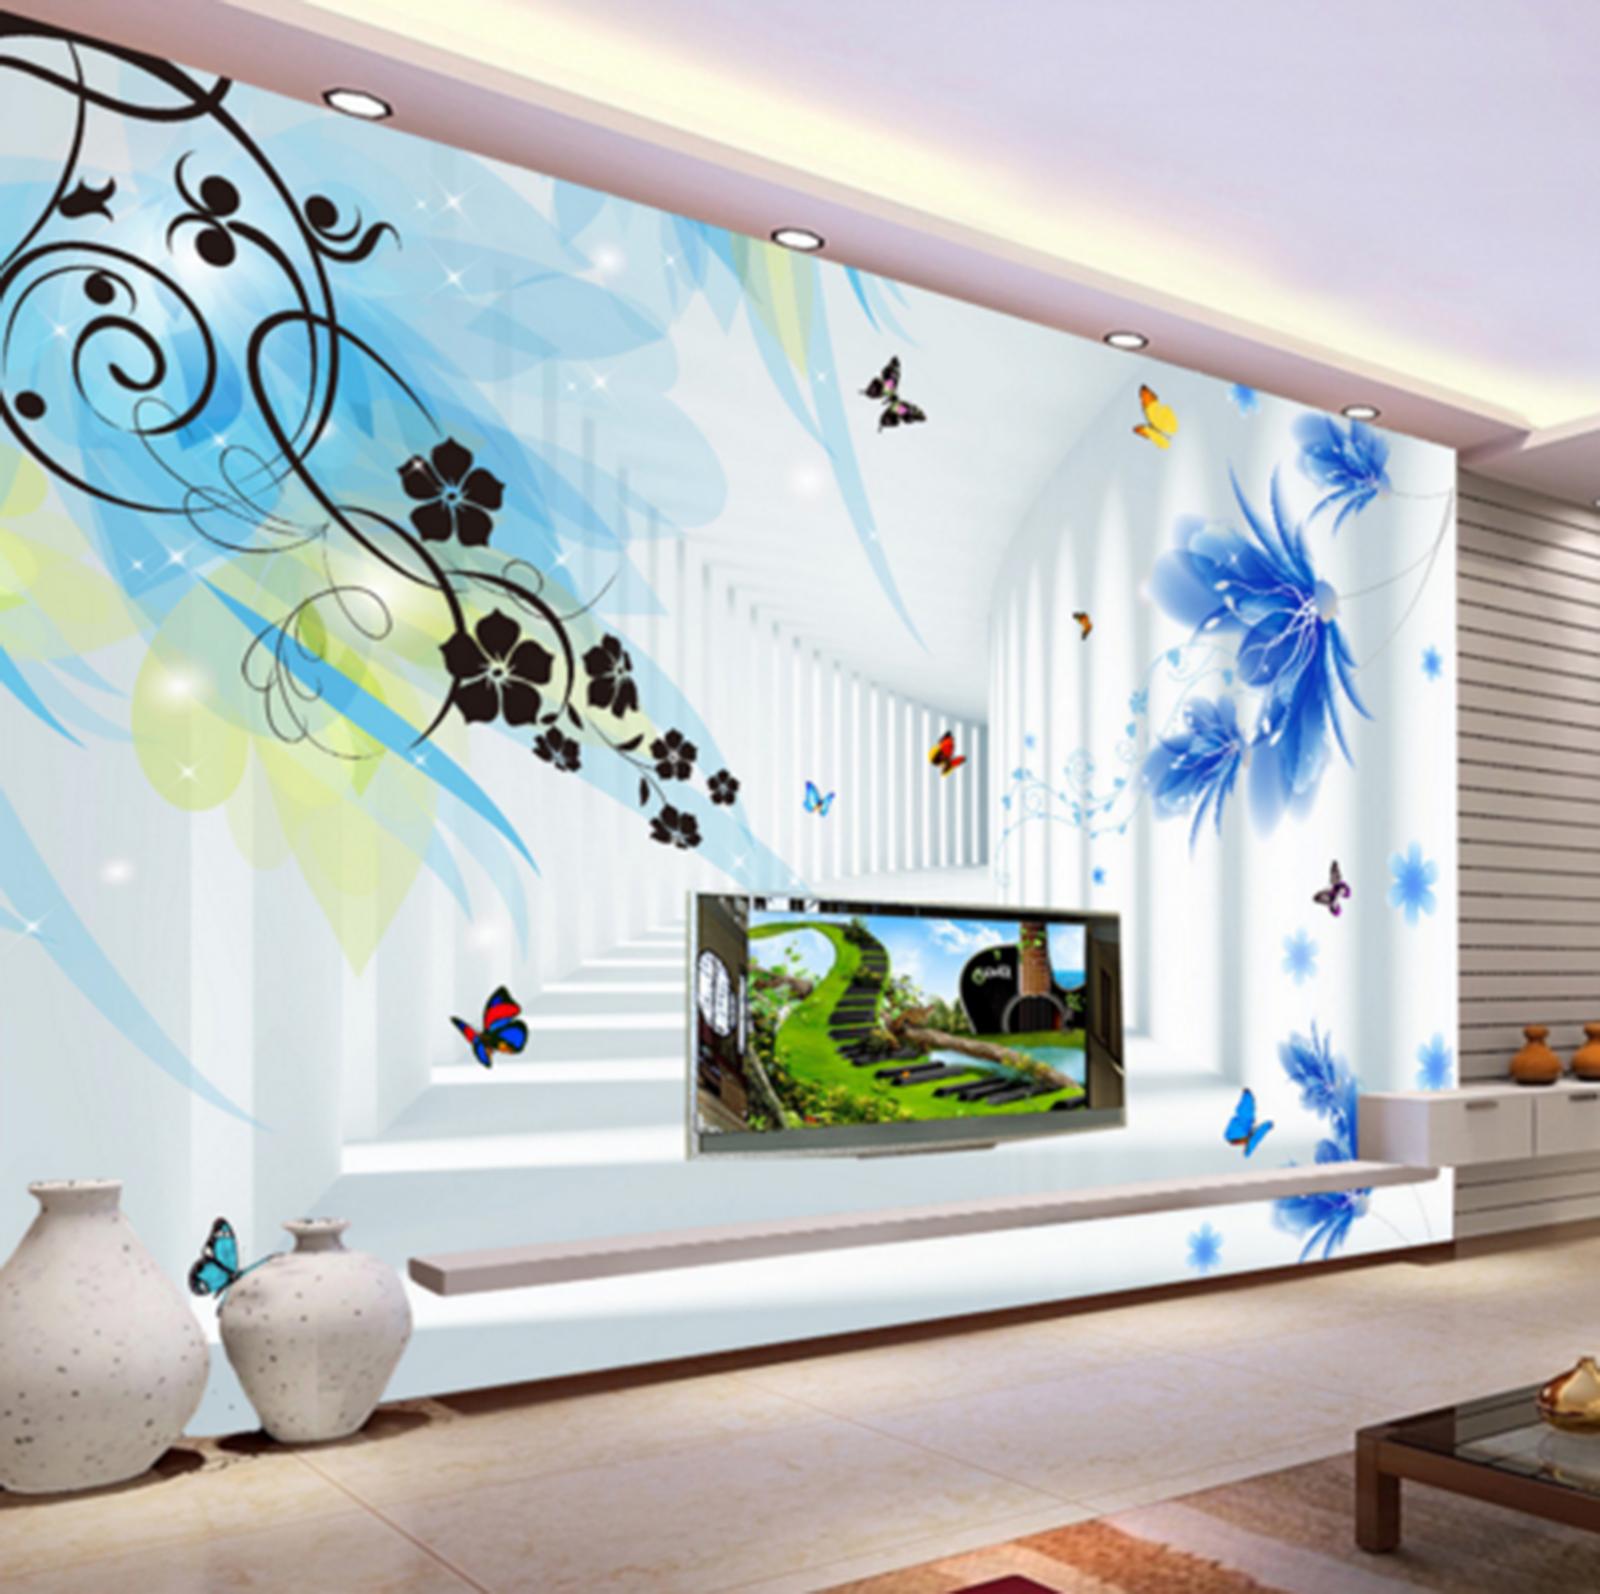 3D Infloresce 428 Wallpaper Murals Wall Print Wallpaper Mural AJ WALL UK Kyra